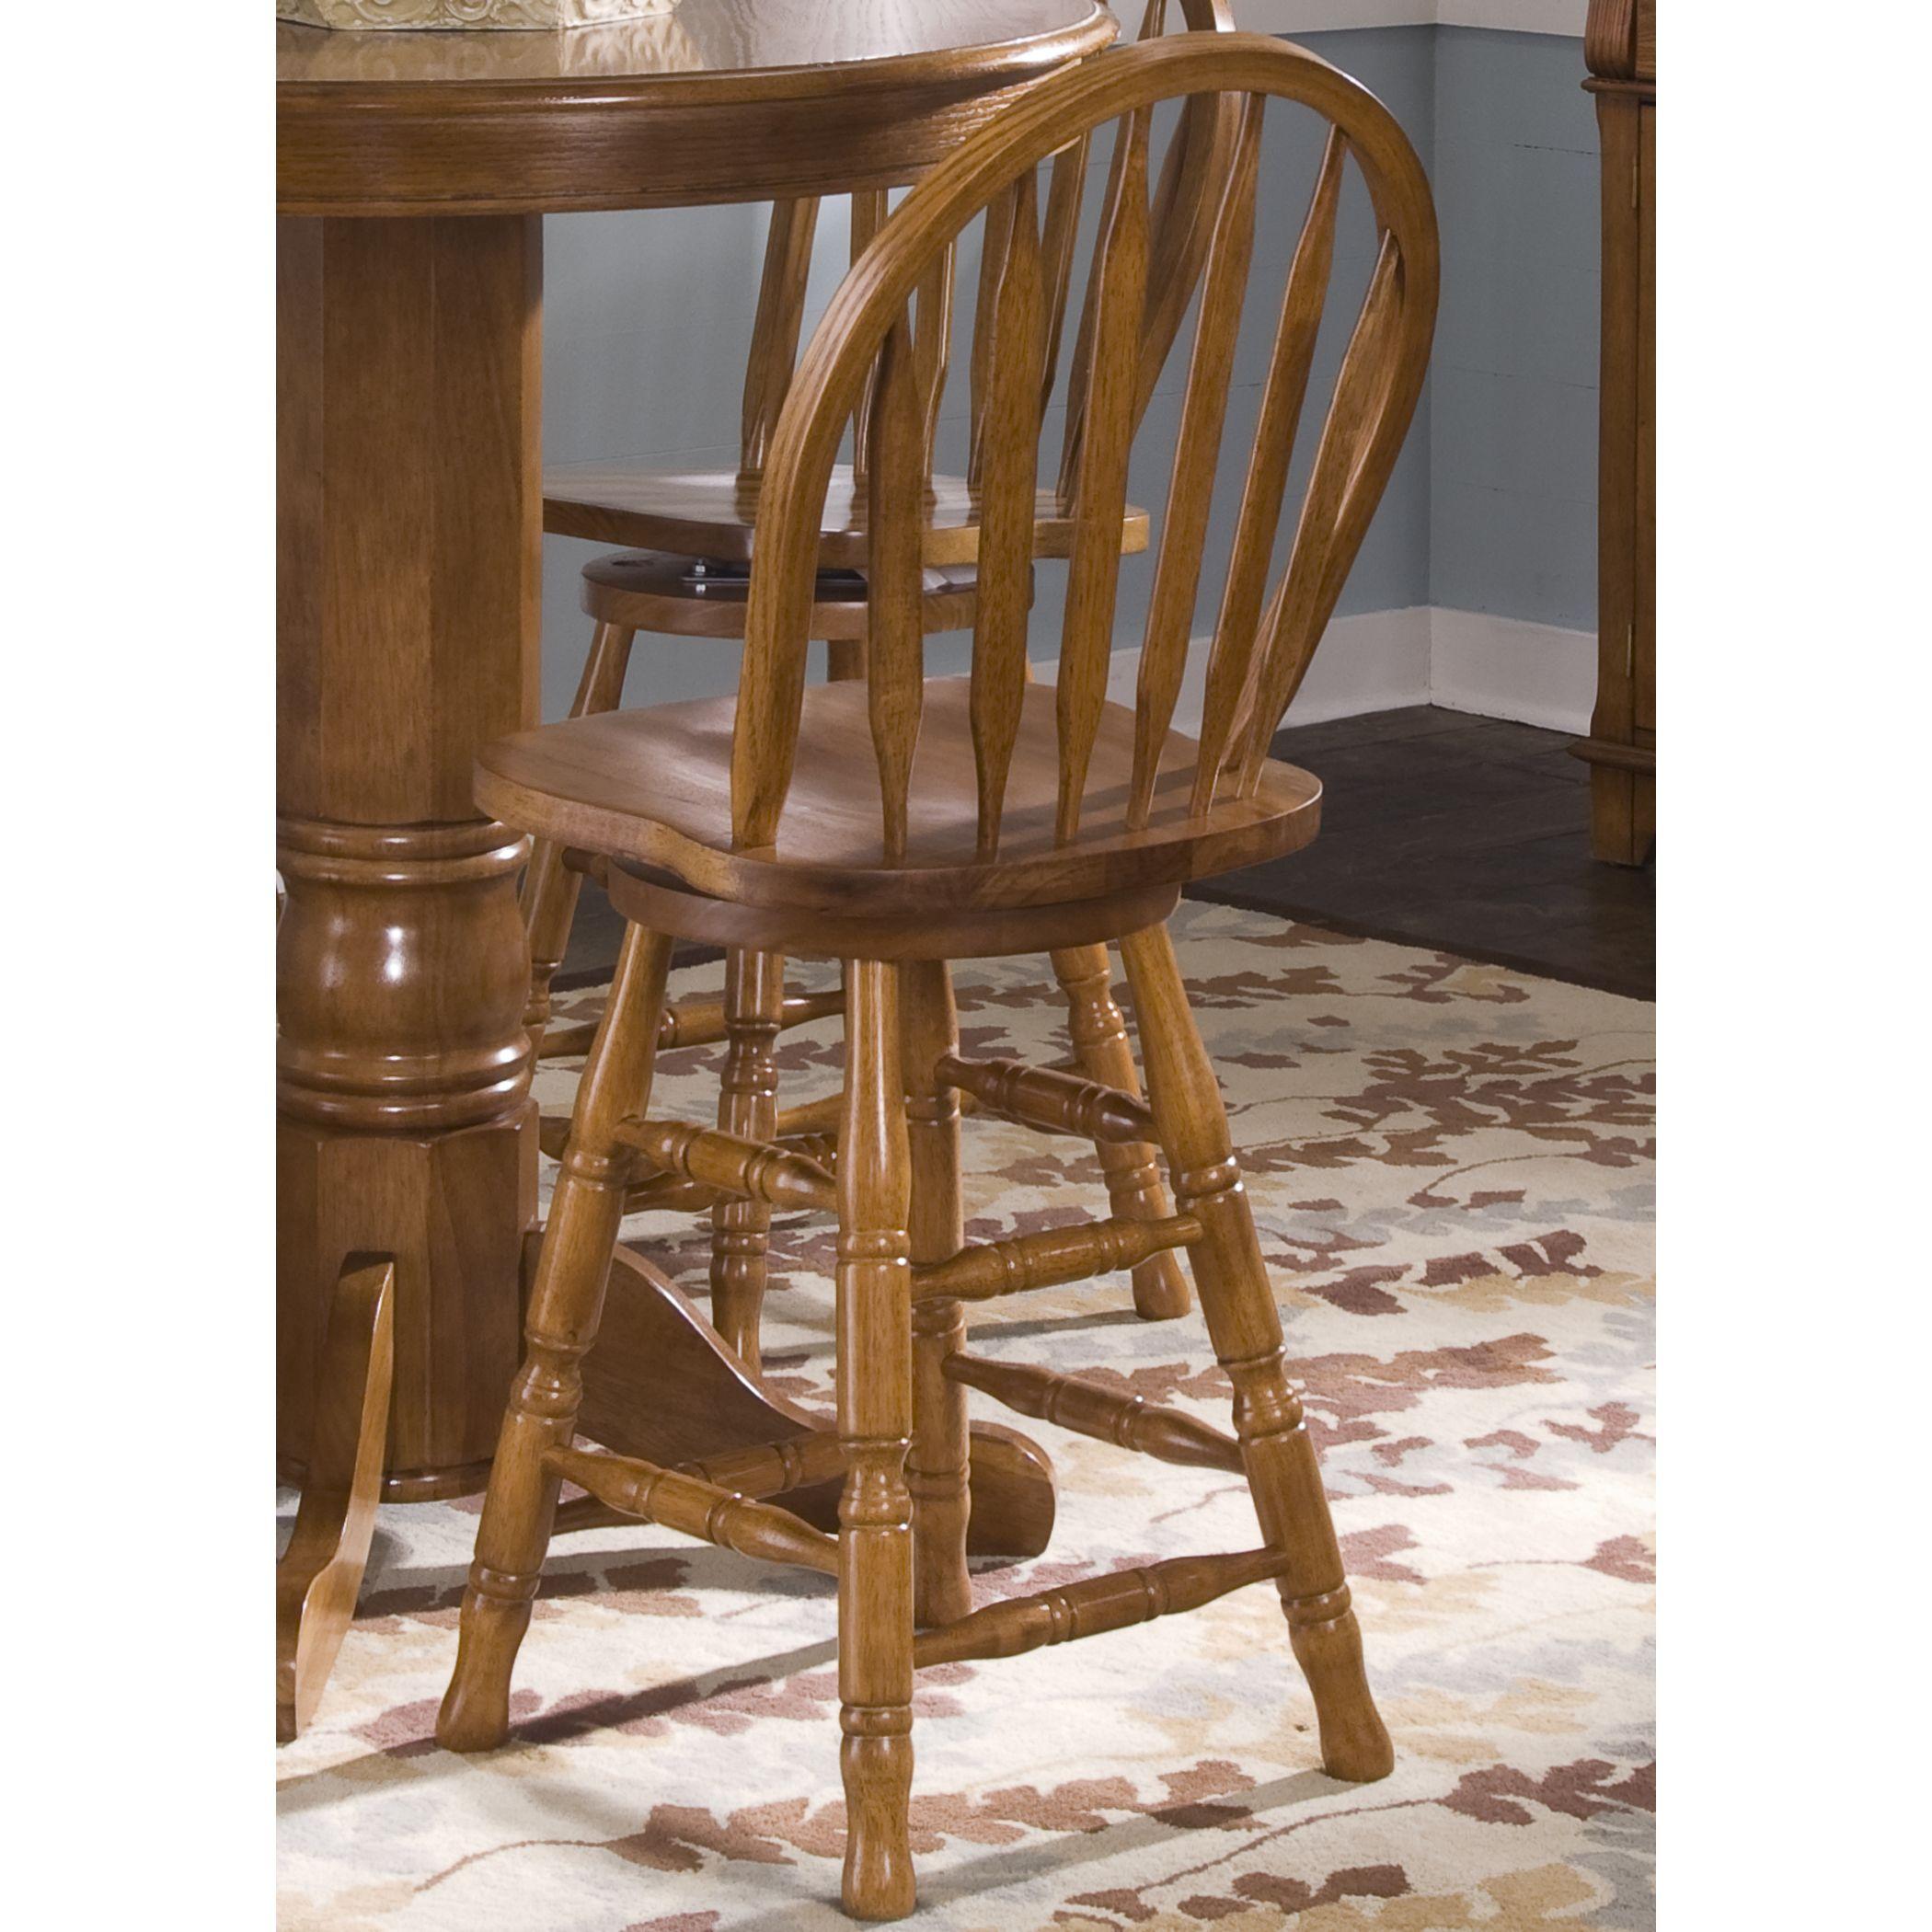 Astonishing Liberty Nostalgia Traditional Oak Arrow Back Swivel Barstool Inzonedesignstudio Interior Chair Design Inzonedesignstudiocom